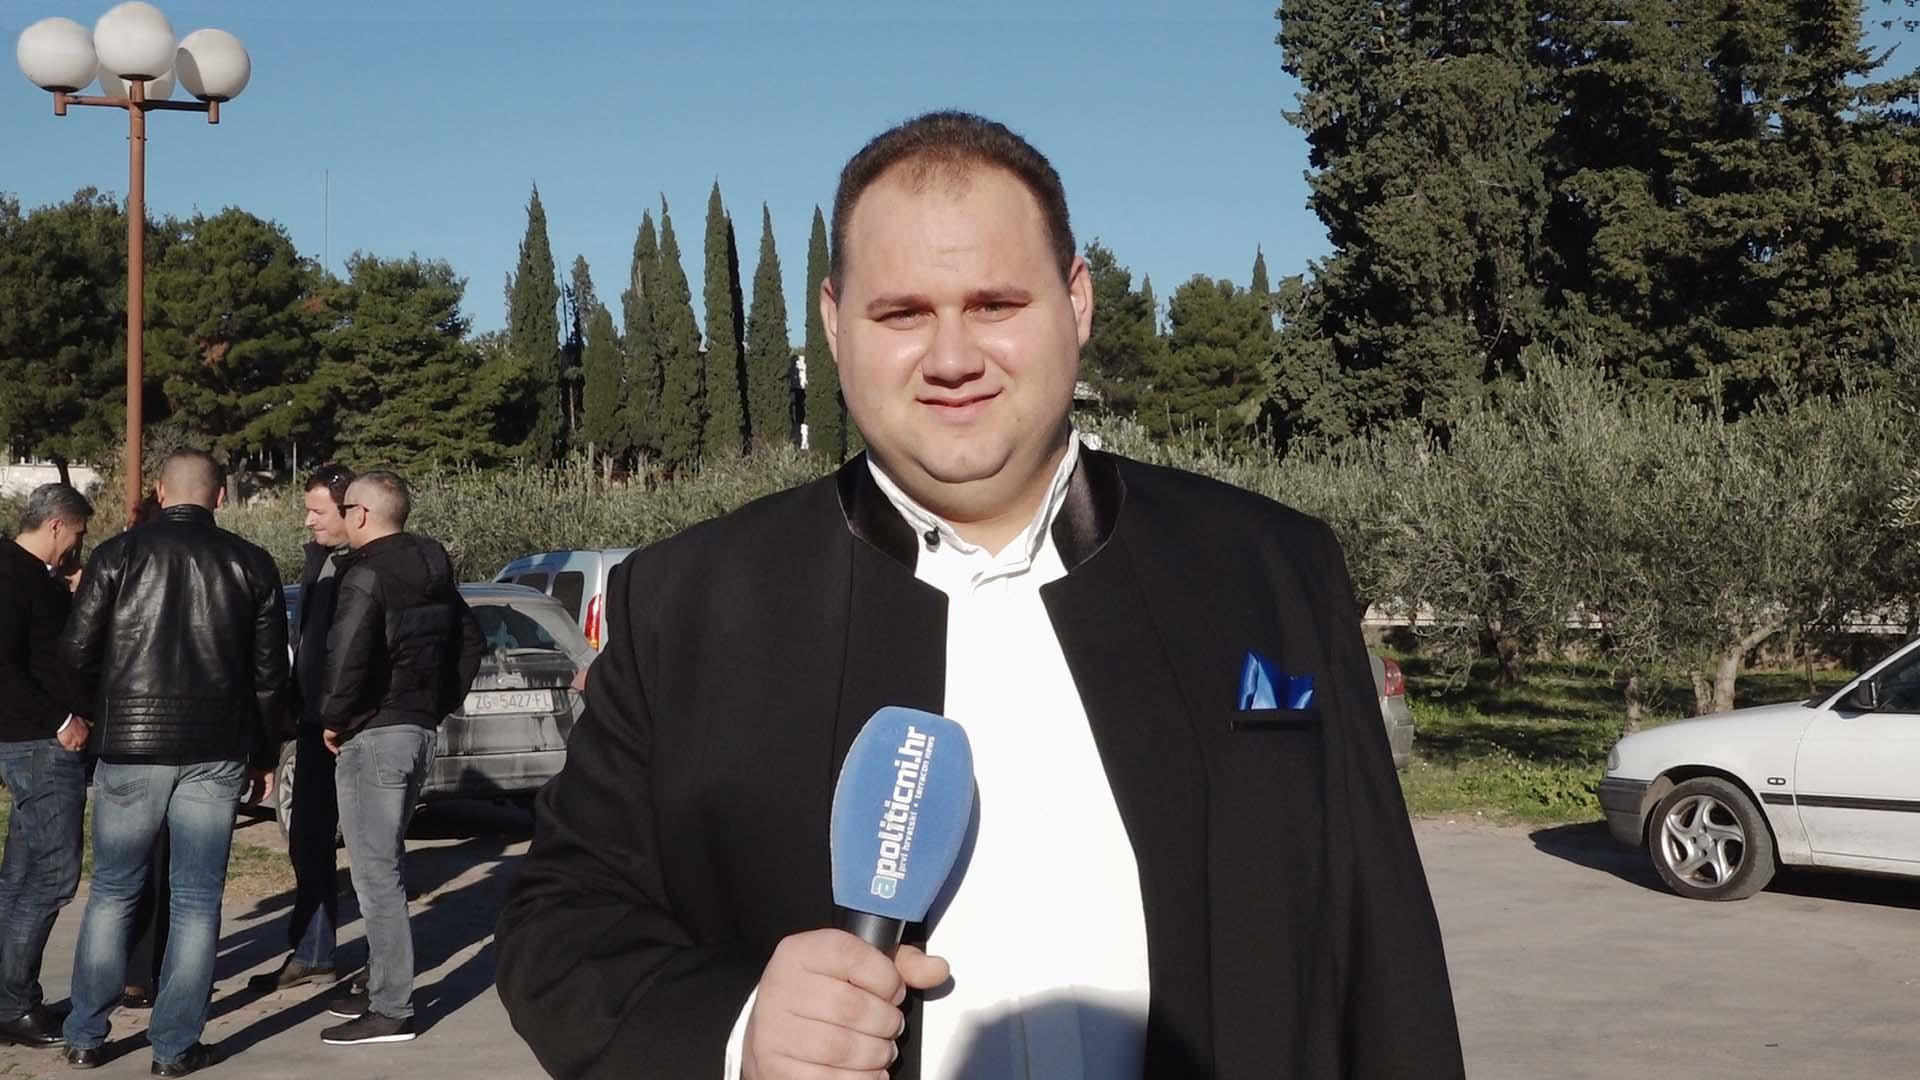 Branko Medak glasom i pjesmom osvaja